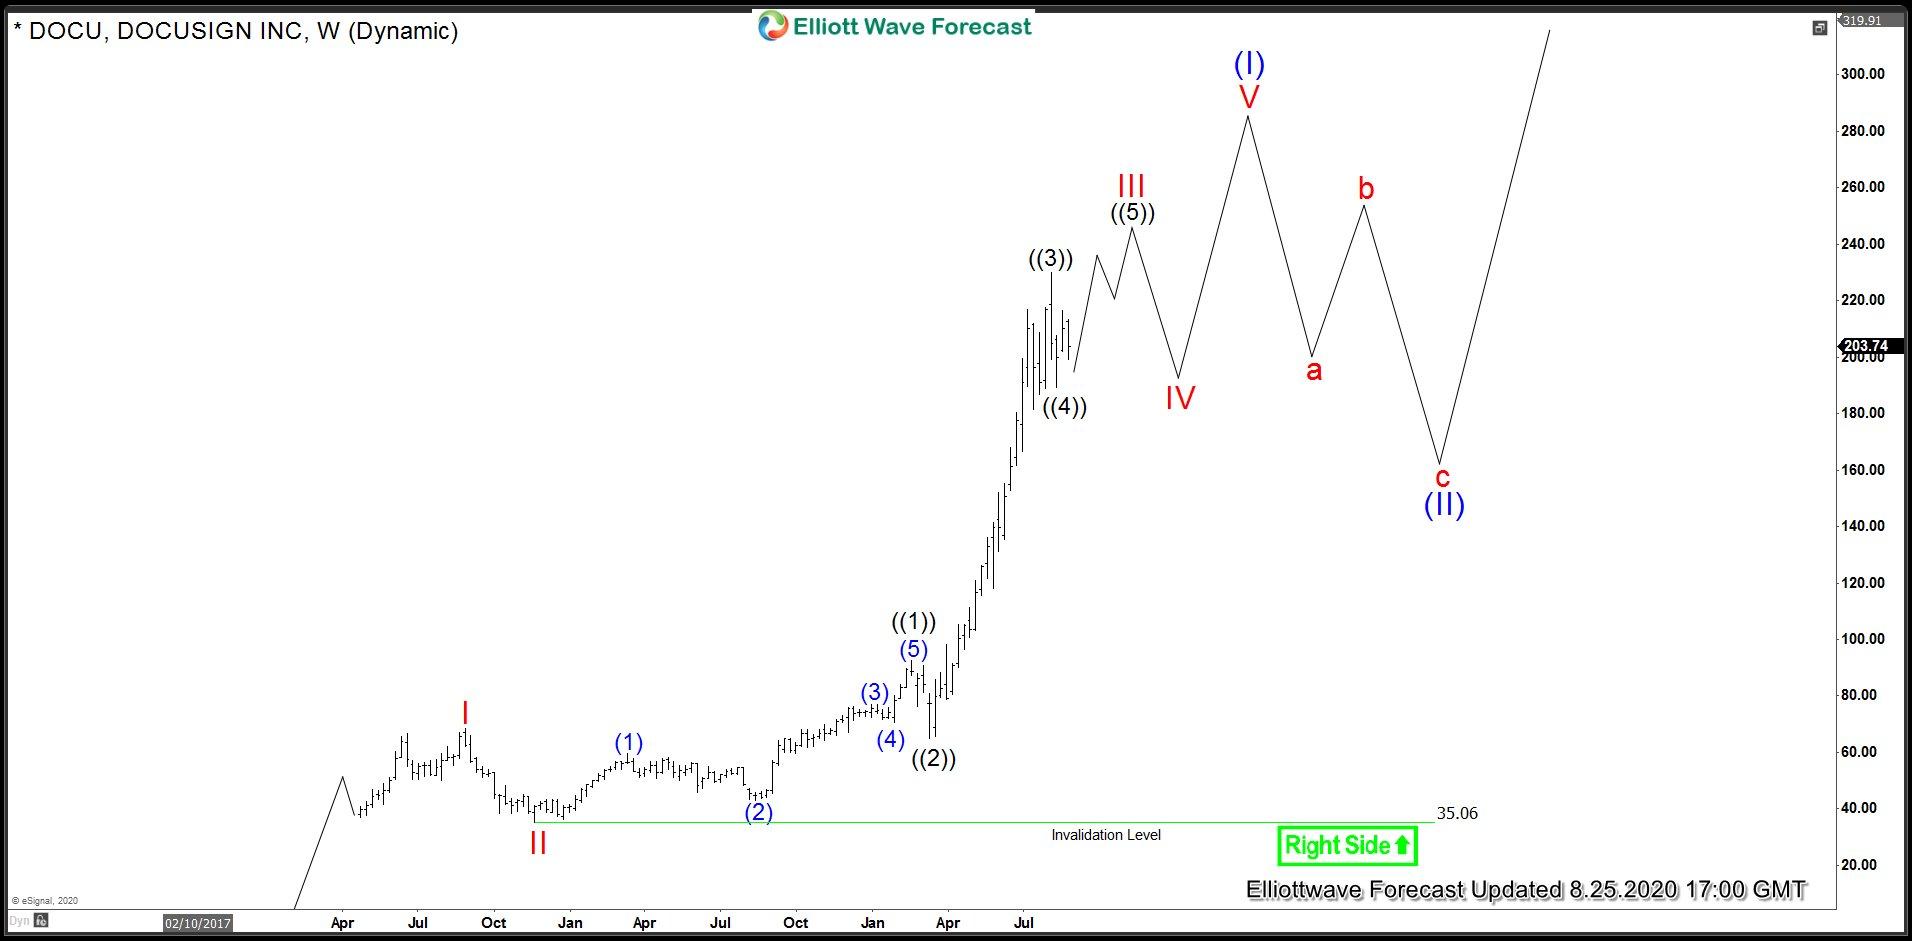 DOCU Weekly Elliott Wave Analysis